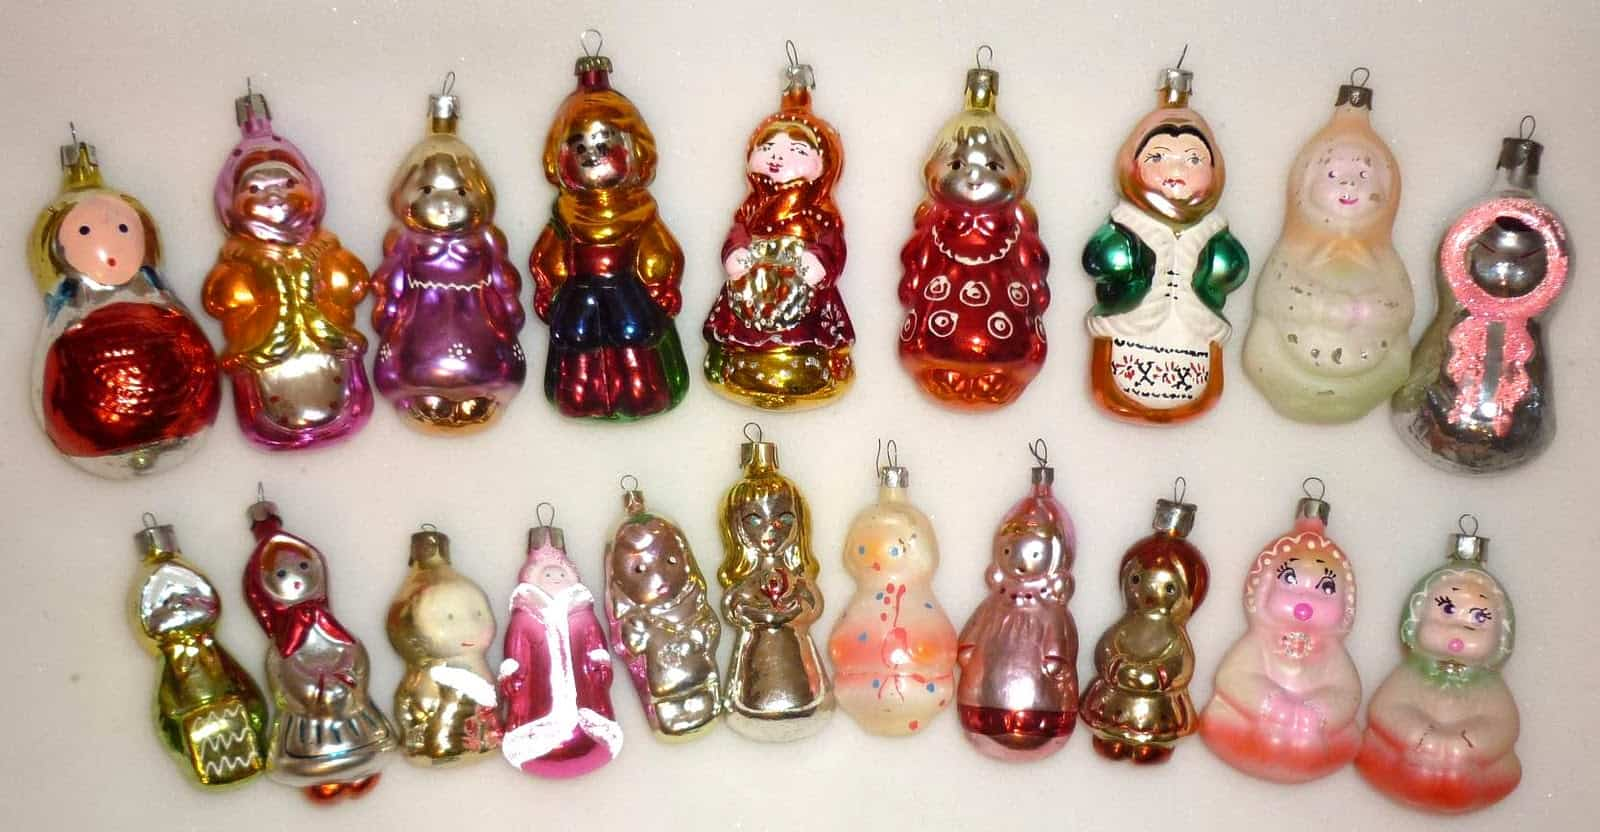 Хрупкое чудо на новогодней елке Хрупкое чудо на новогодней елке 2 20